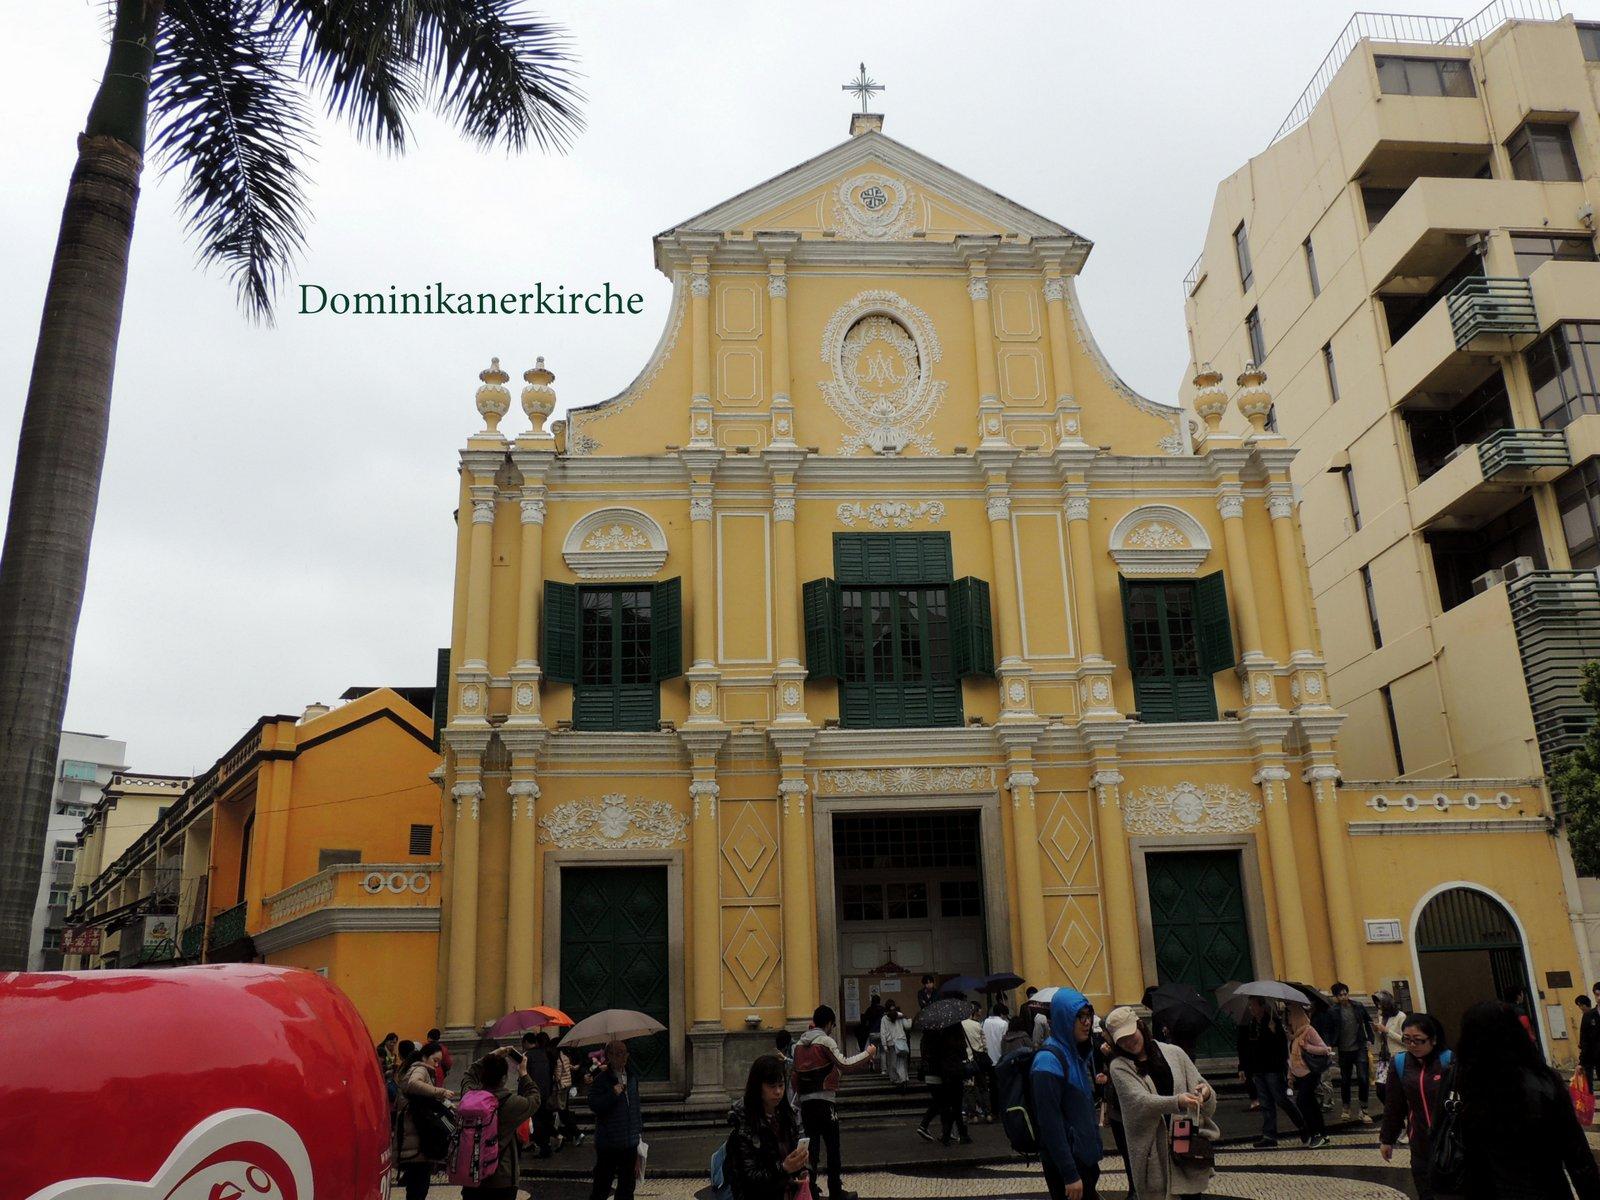 Dominikanerkirche Macau